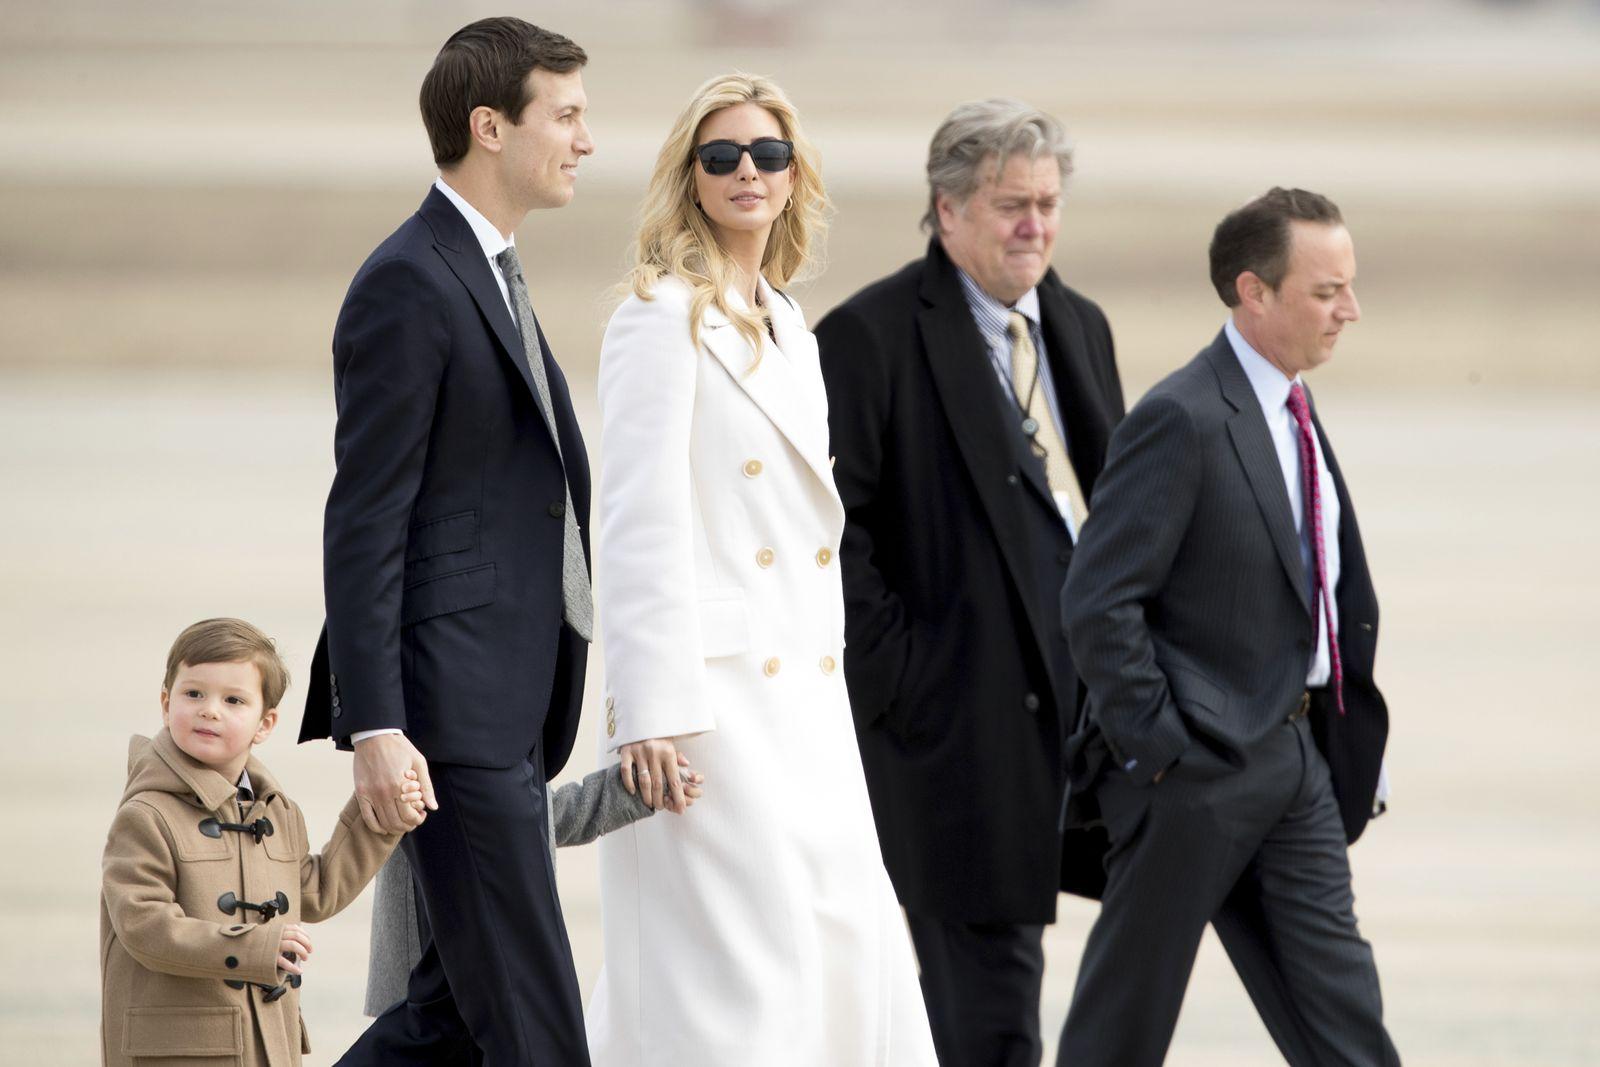 Kushner-Trump (SPIN/PLUS) 03/2018 S.10